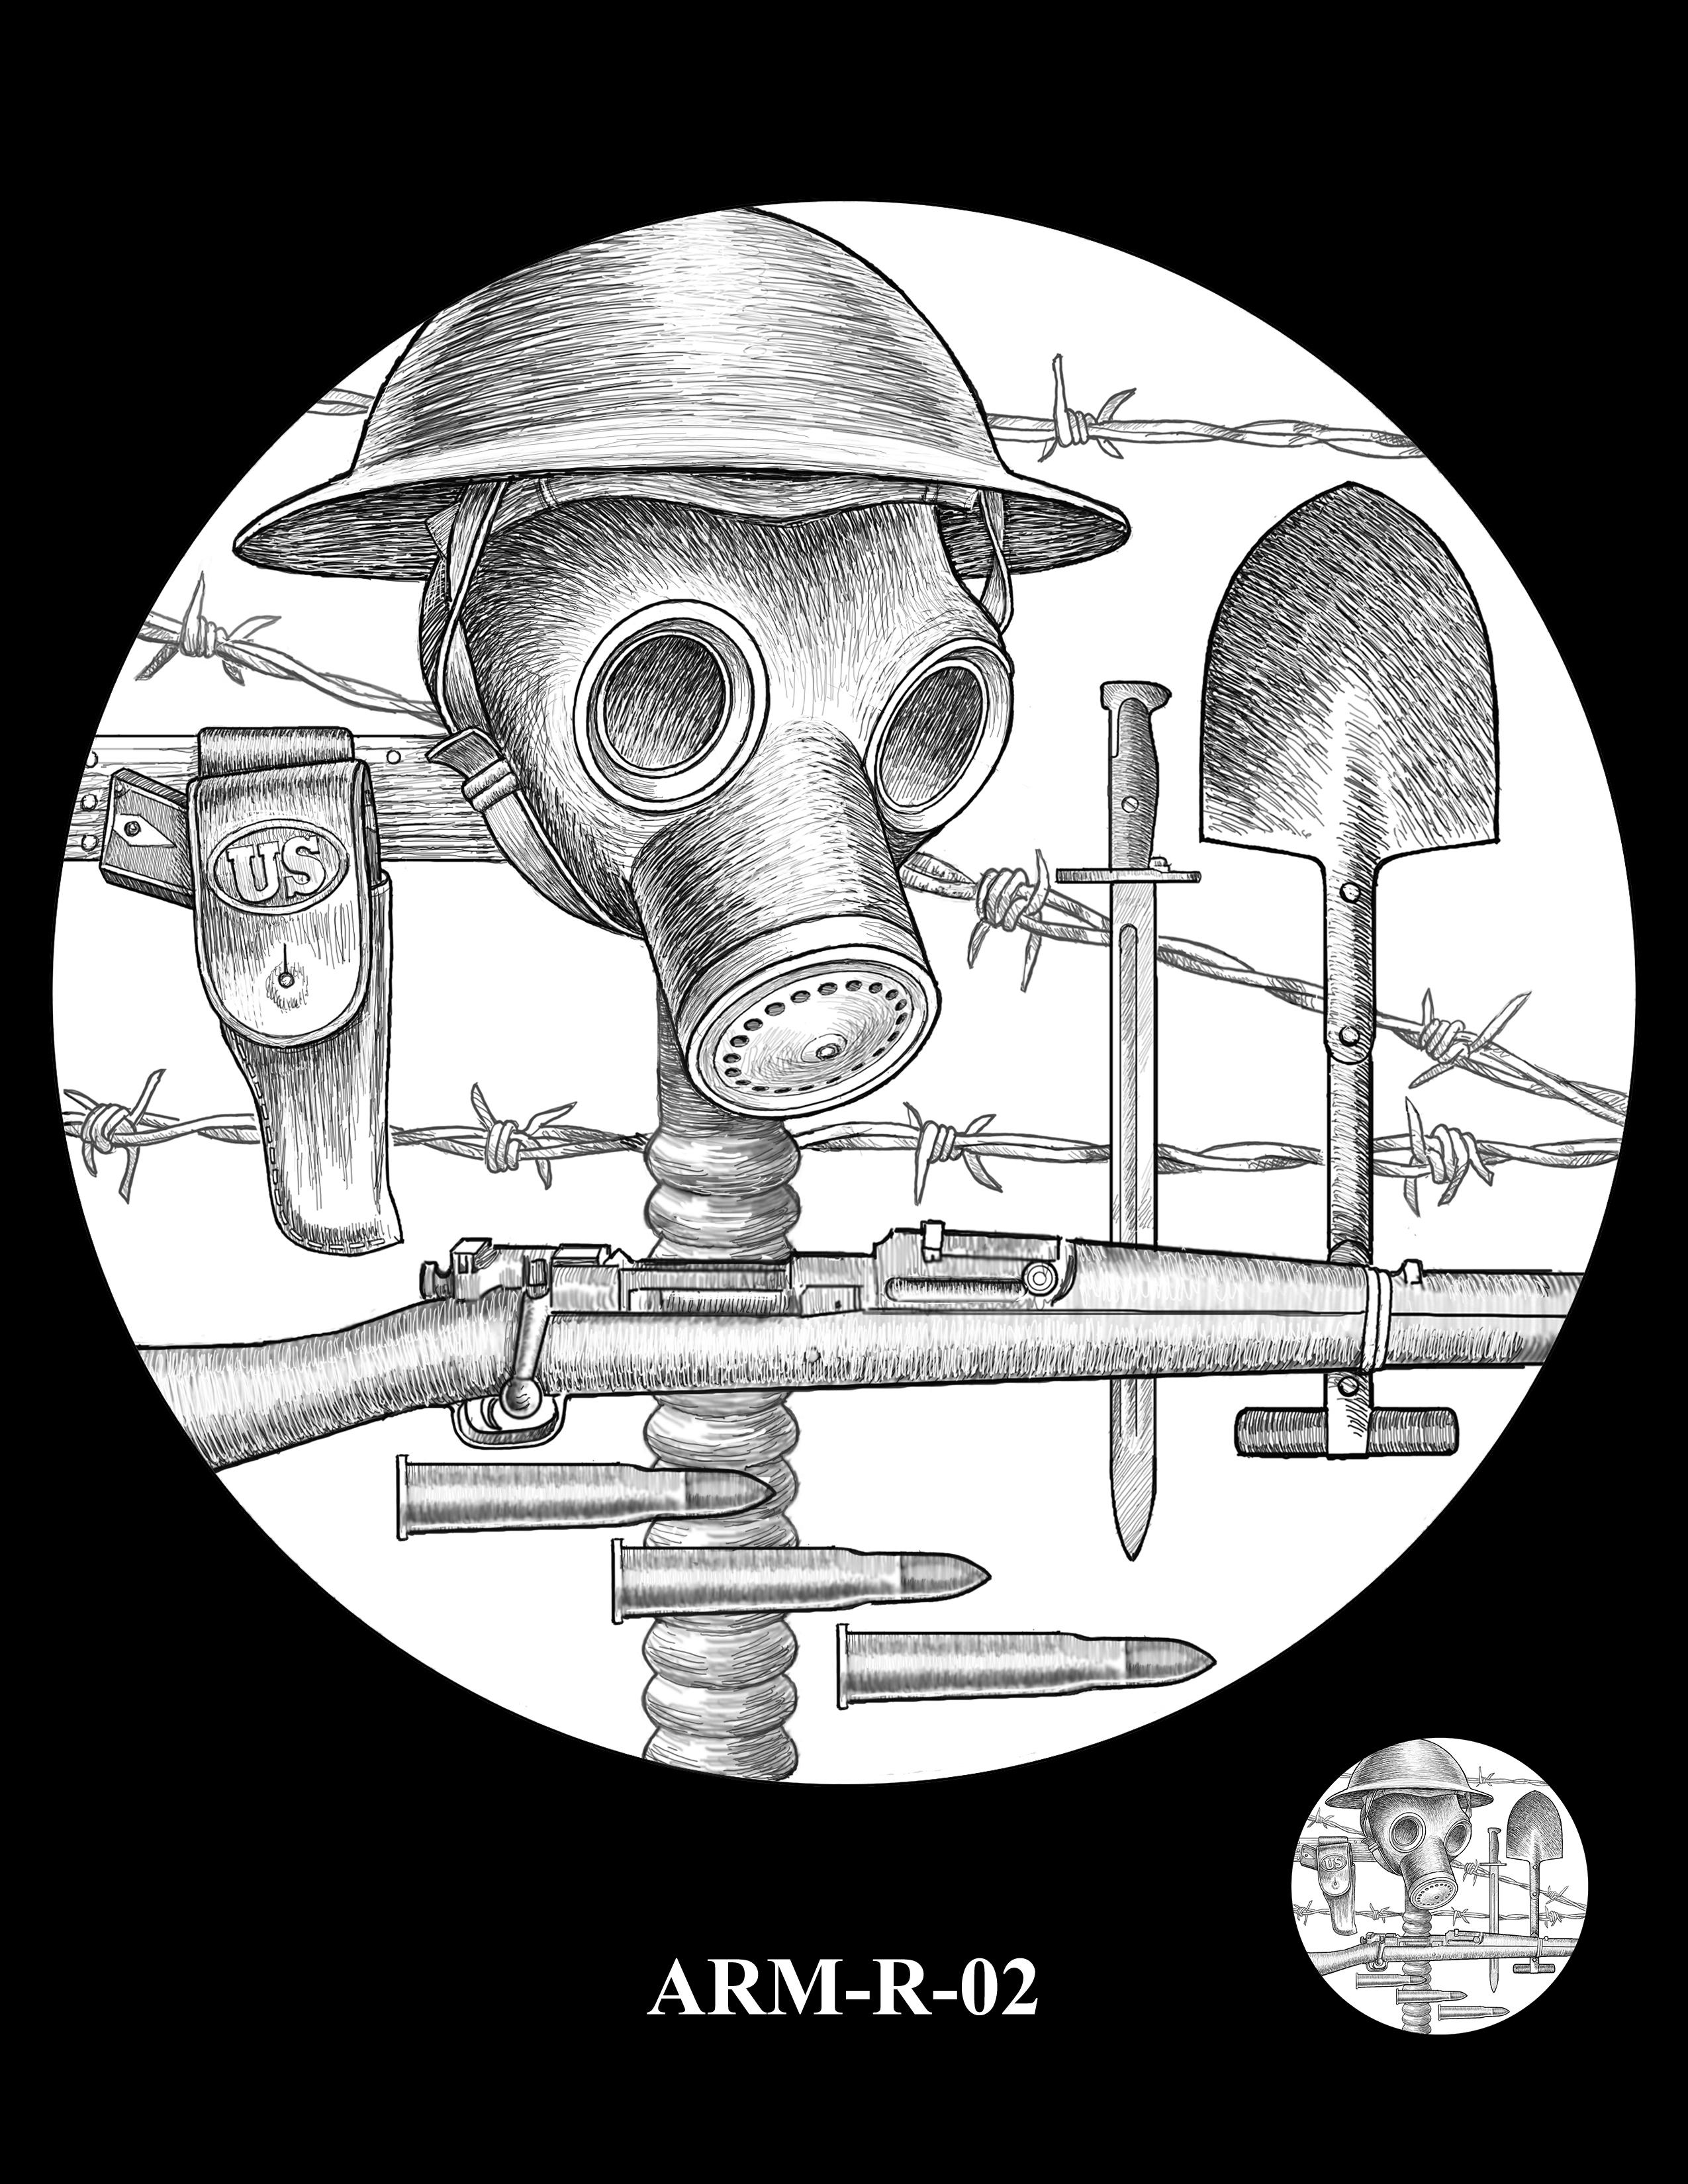 P1-ARM-R-02 -- 2018-World War I Silver Medals - Army